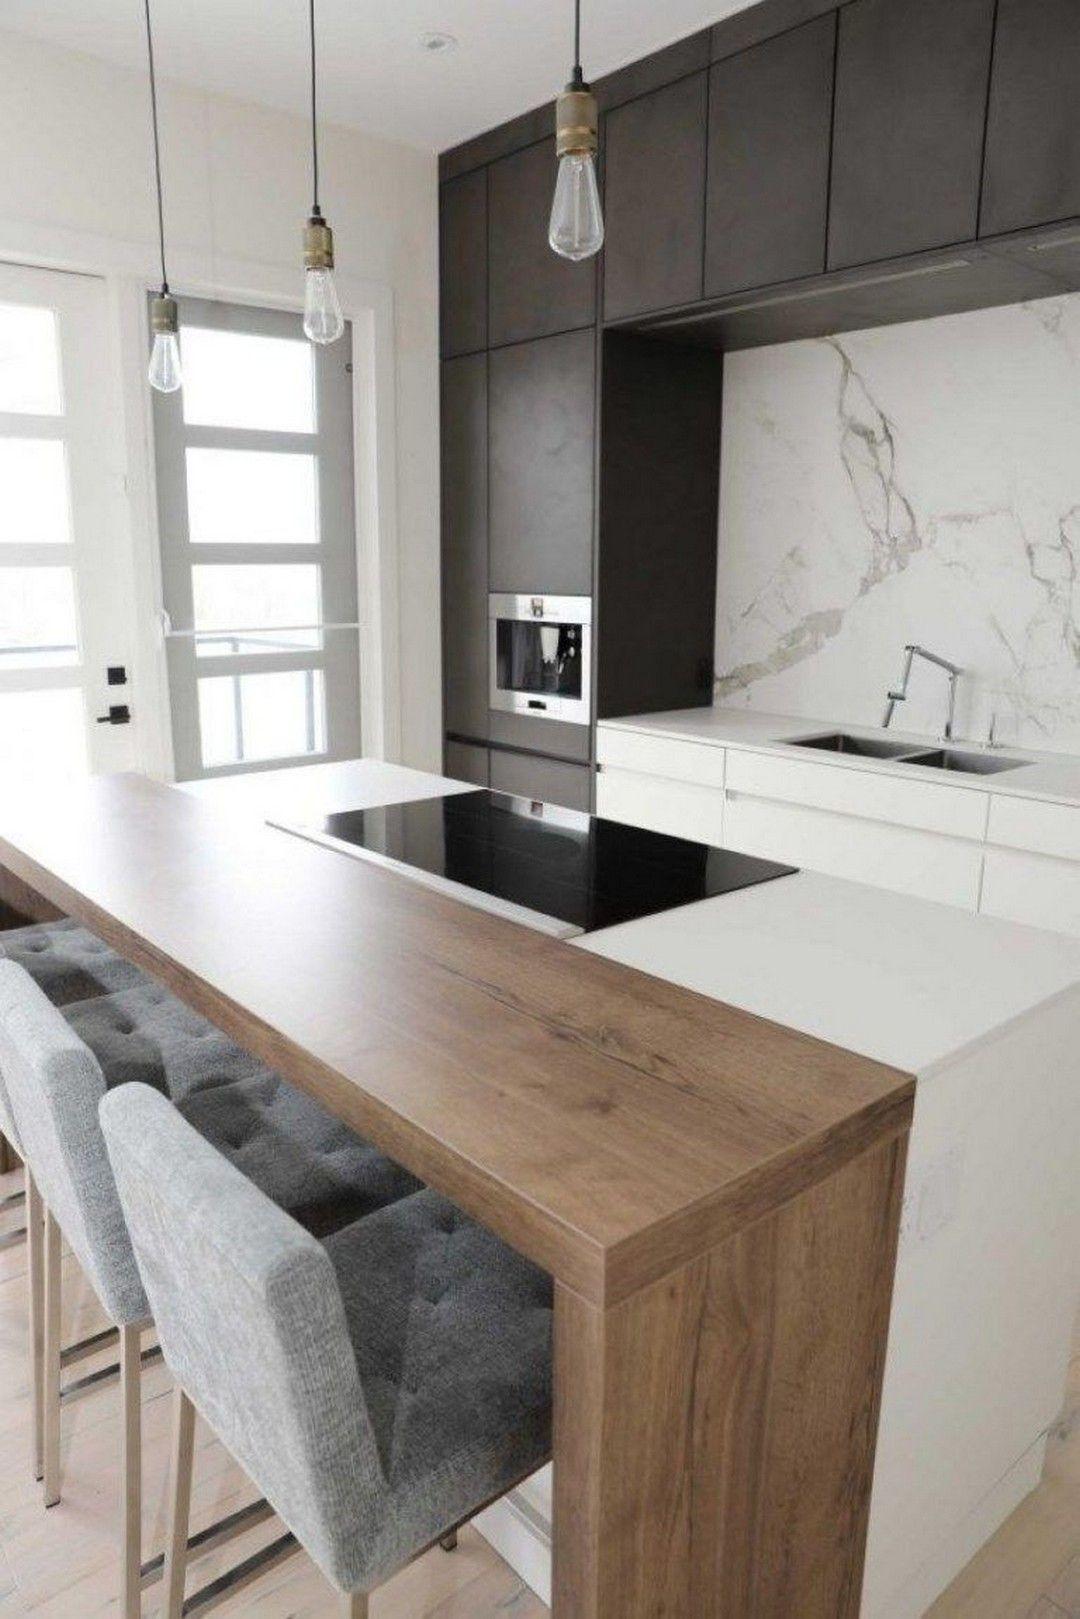 Exciting Small Modern Kitchen Design Ideas In 2020 White Modern Kitchen Minimalist Kitchen Design Interior Design Kitchen Small